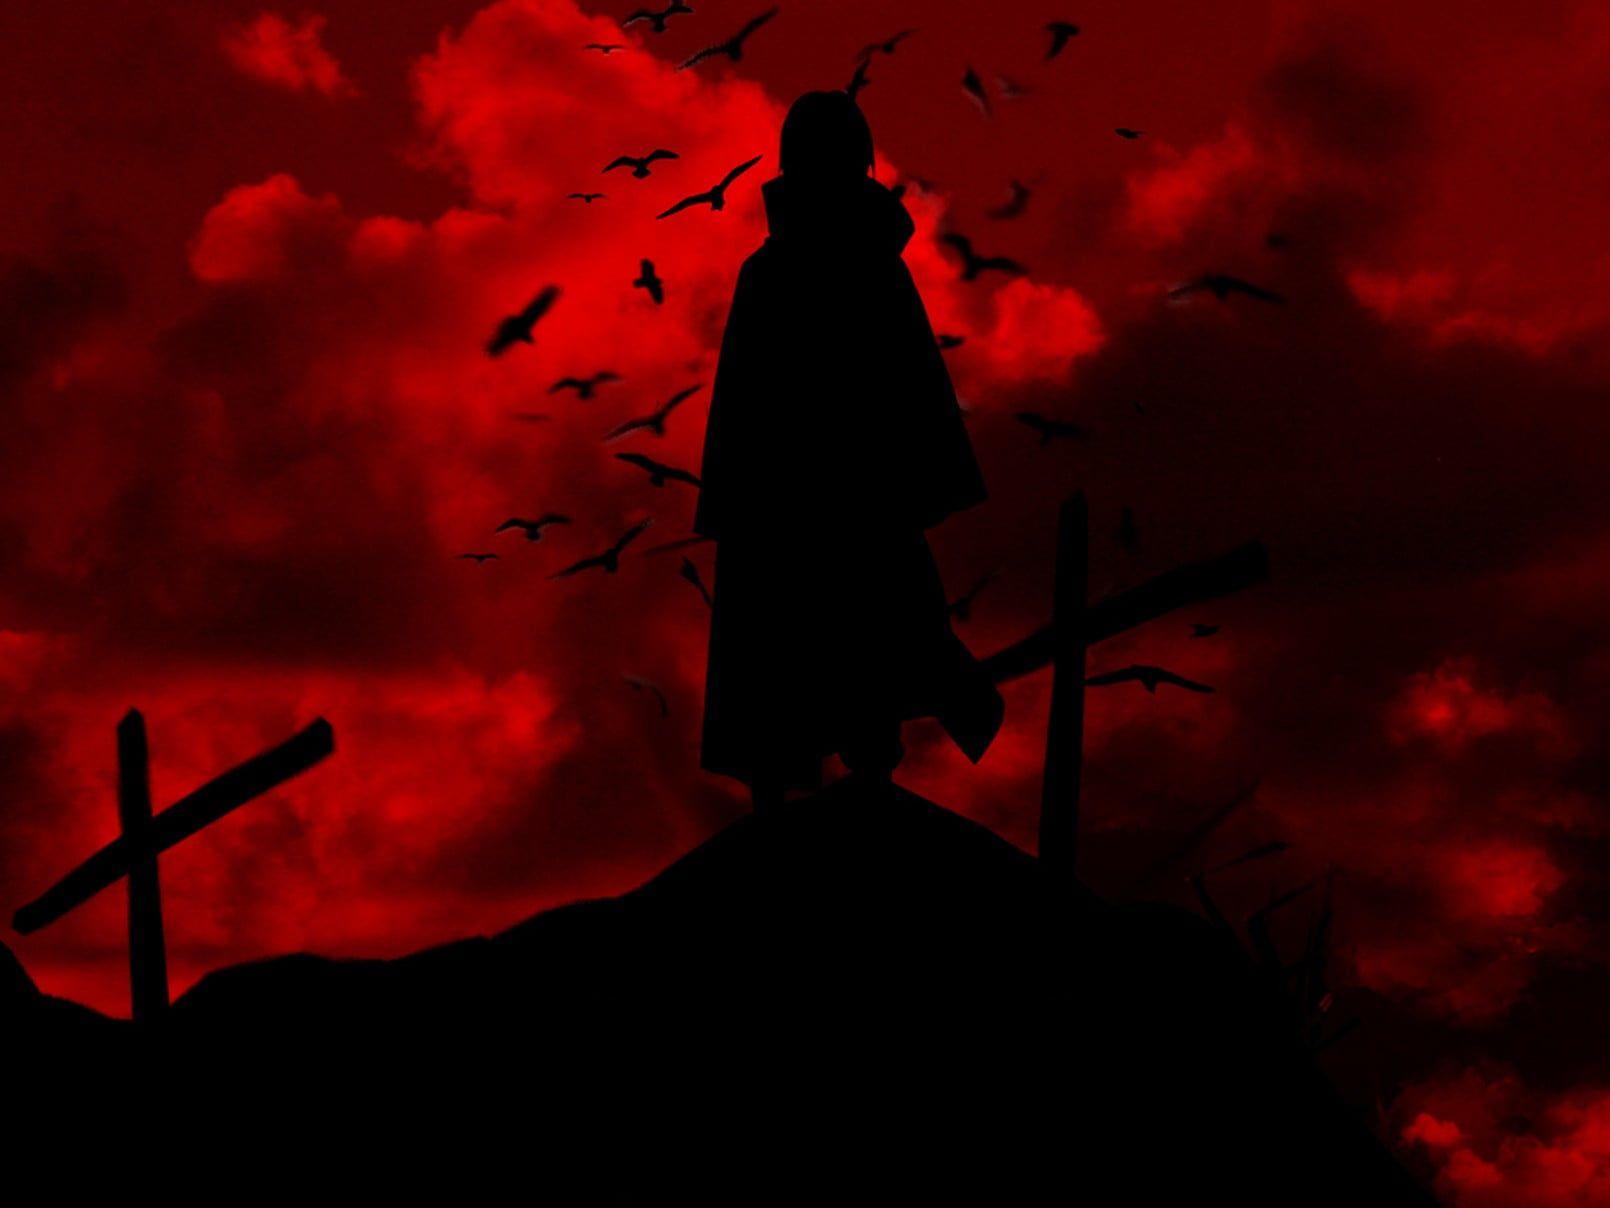 Uchiha Itachi Naruto Shippuuden Silhouette Uchiha Itachi Red Raven Cross Anime 720p Wallpaper Hdwallpaper Des Itachi Uchiha Itachi Mangekyou Sharingan